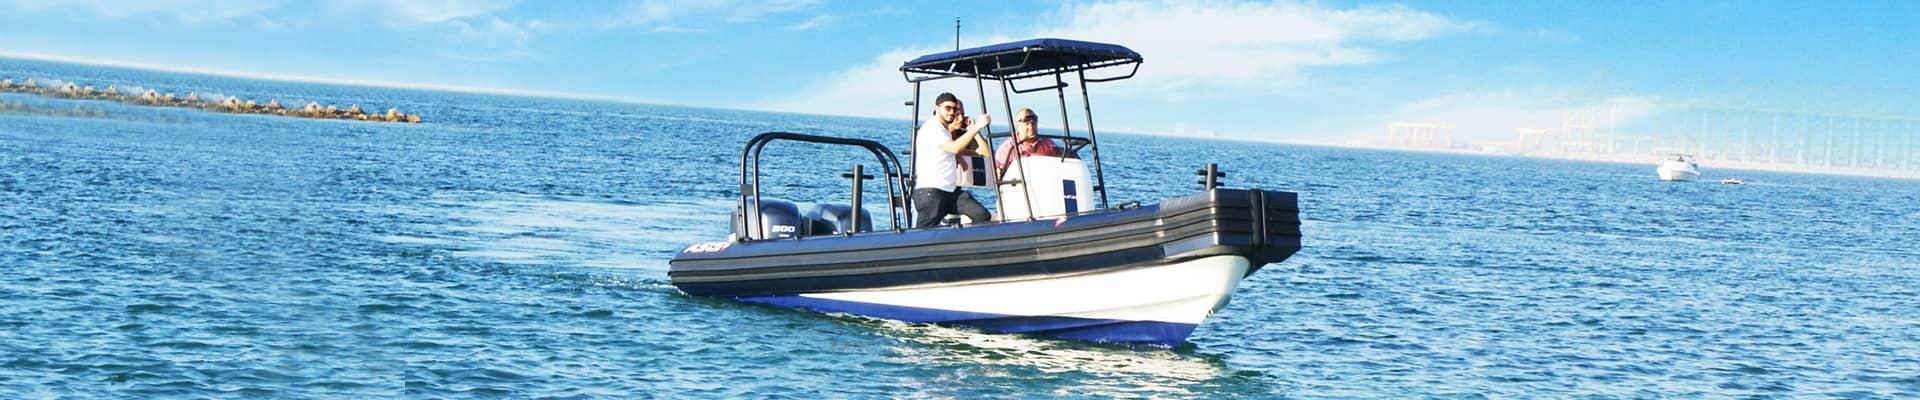 rigid-inflatable-boat